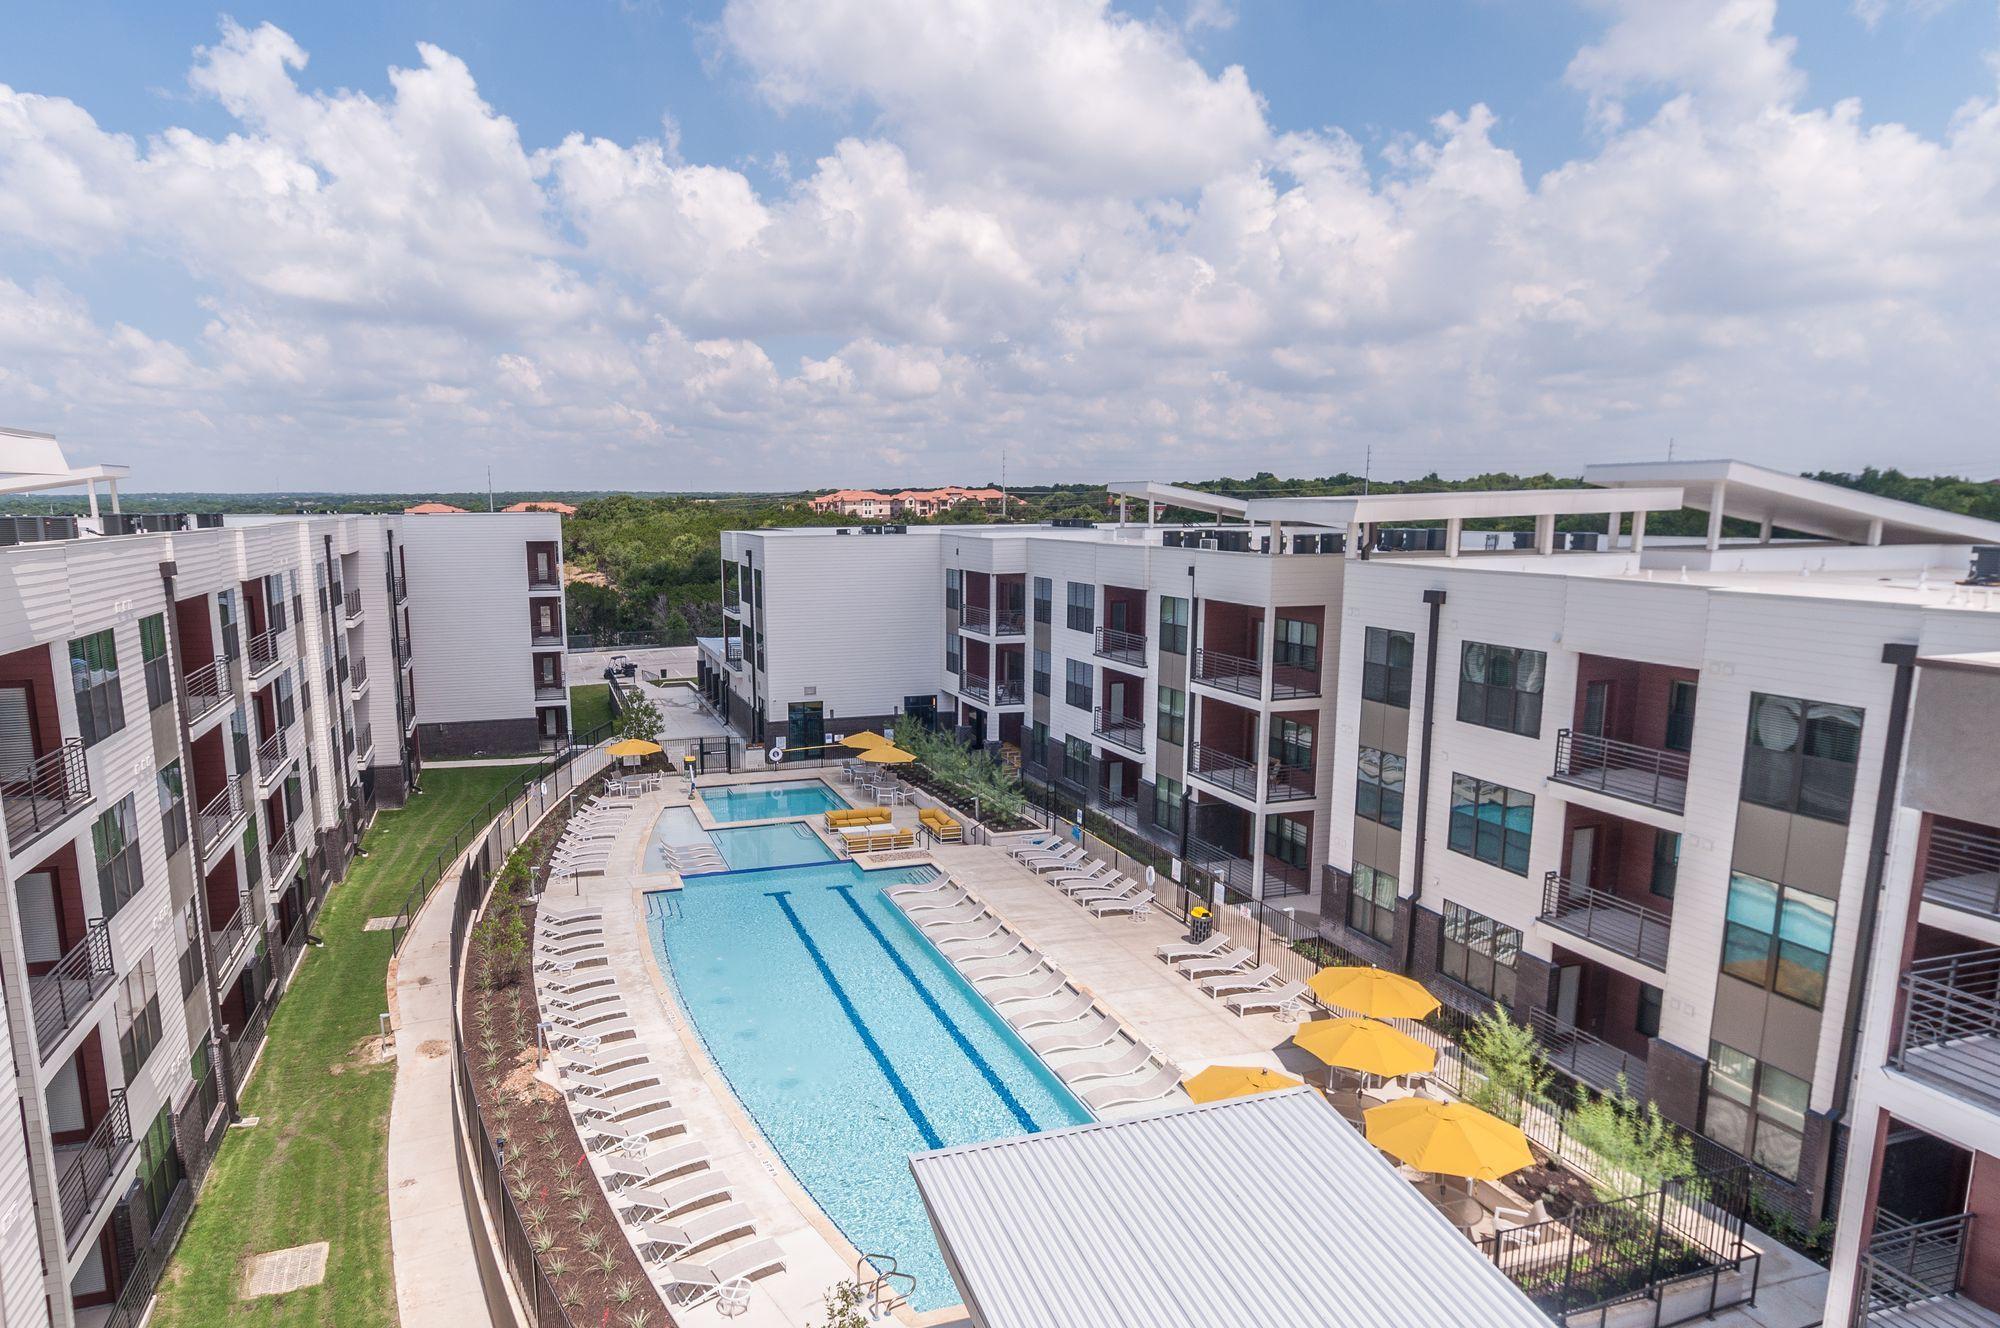 Apartments Near UT Austin Concord Austin for University of Texas - Austin Students in Austin, TX